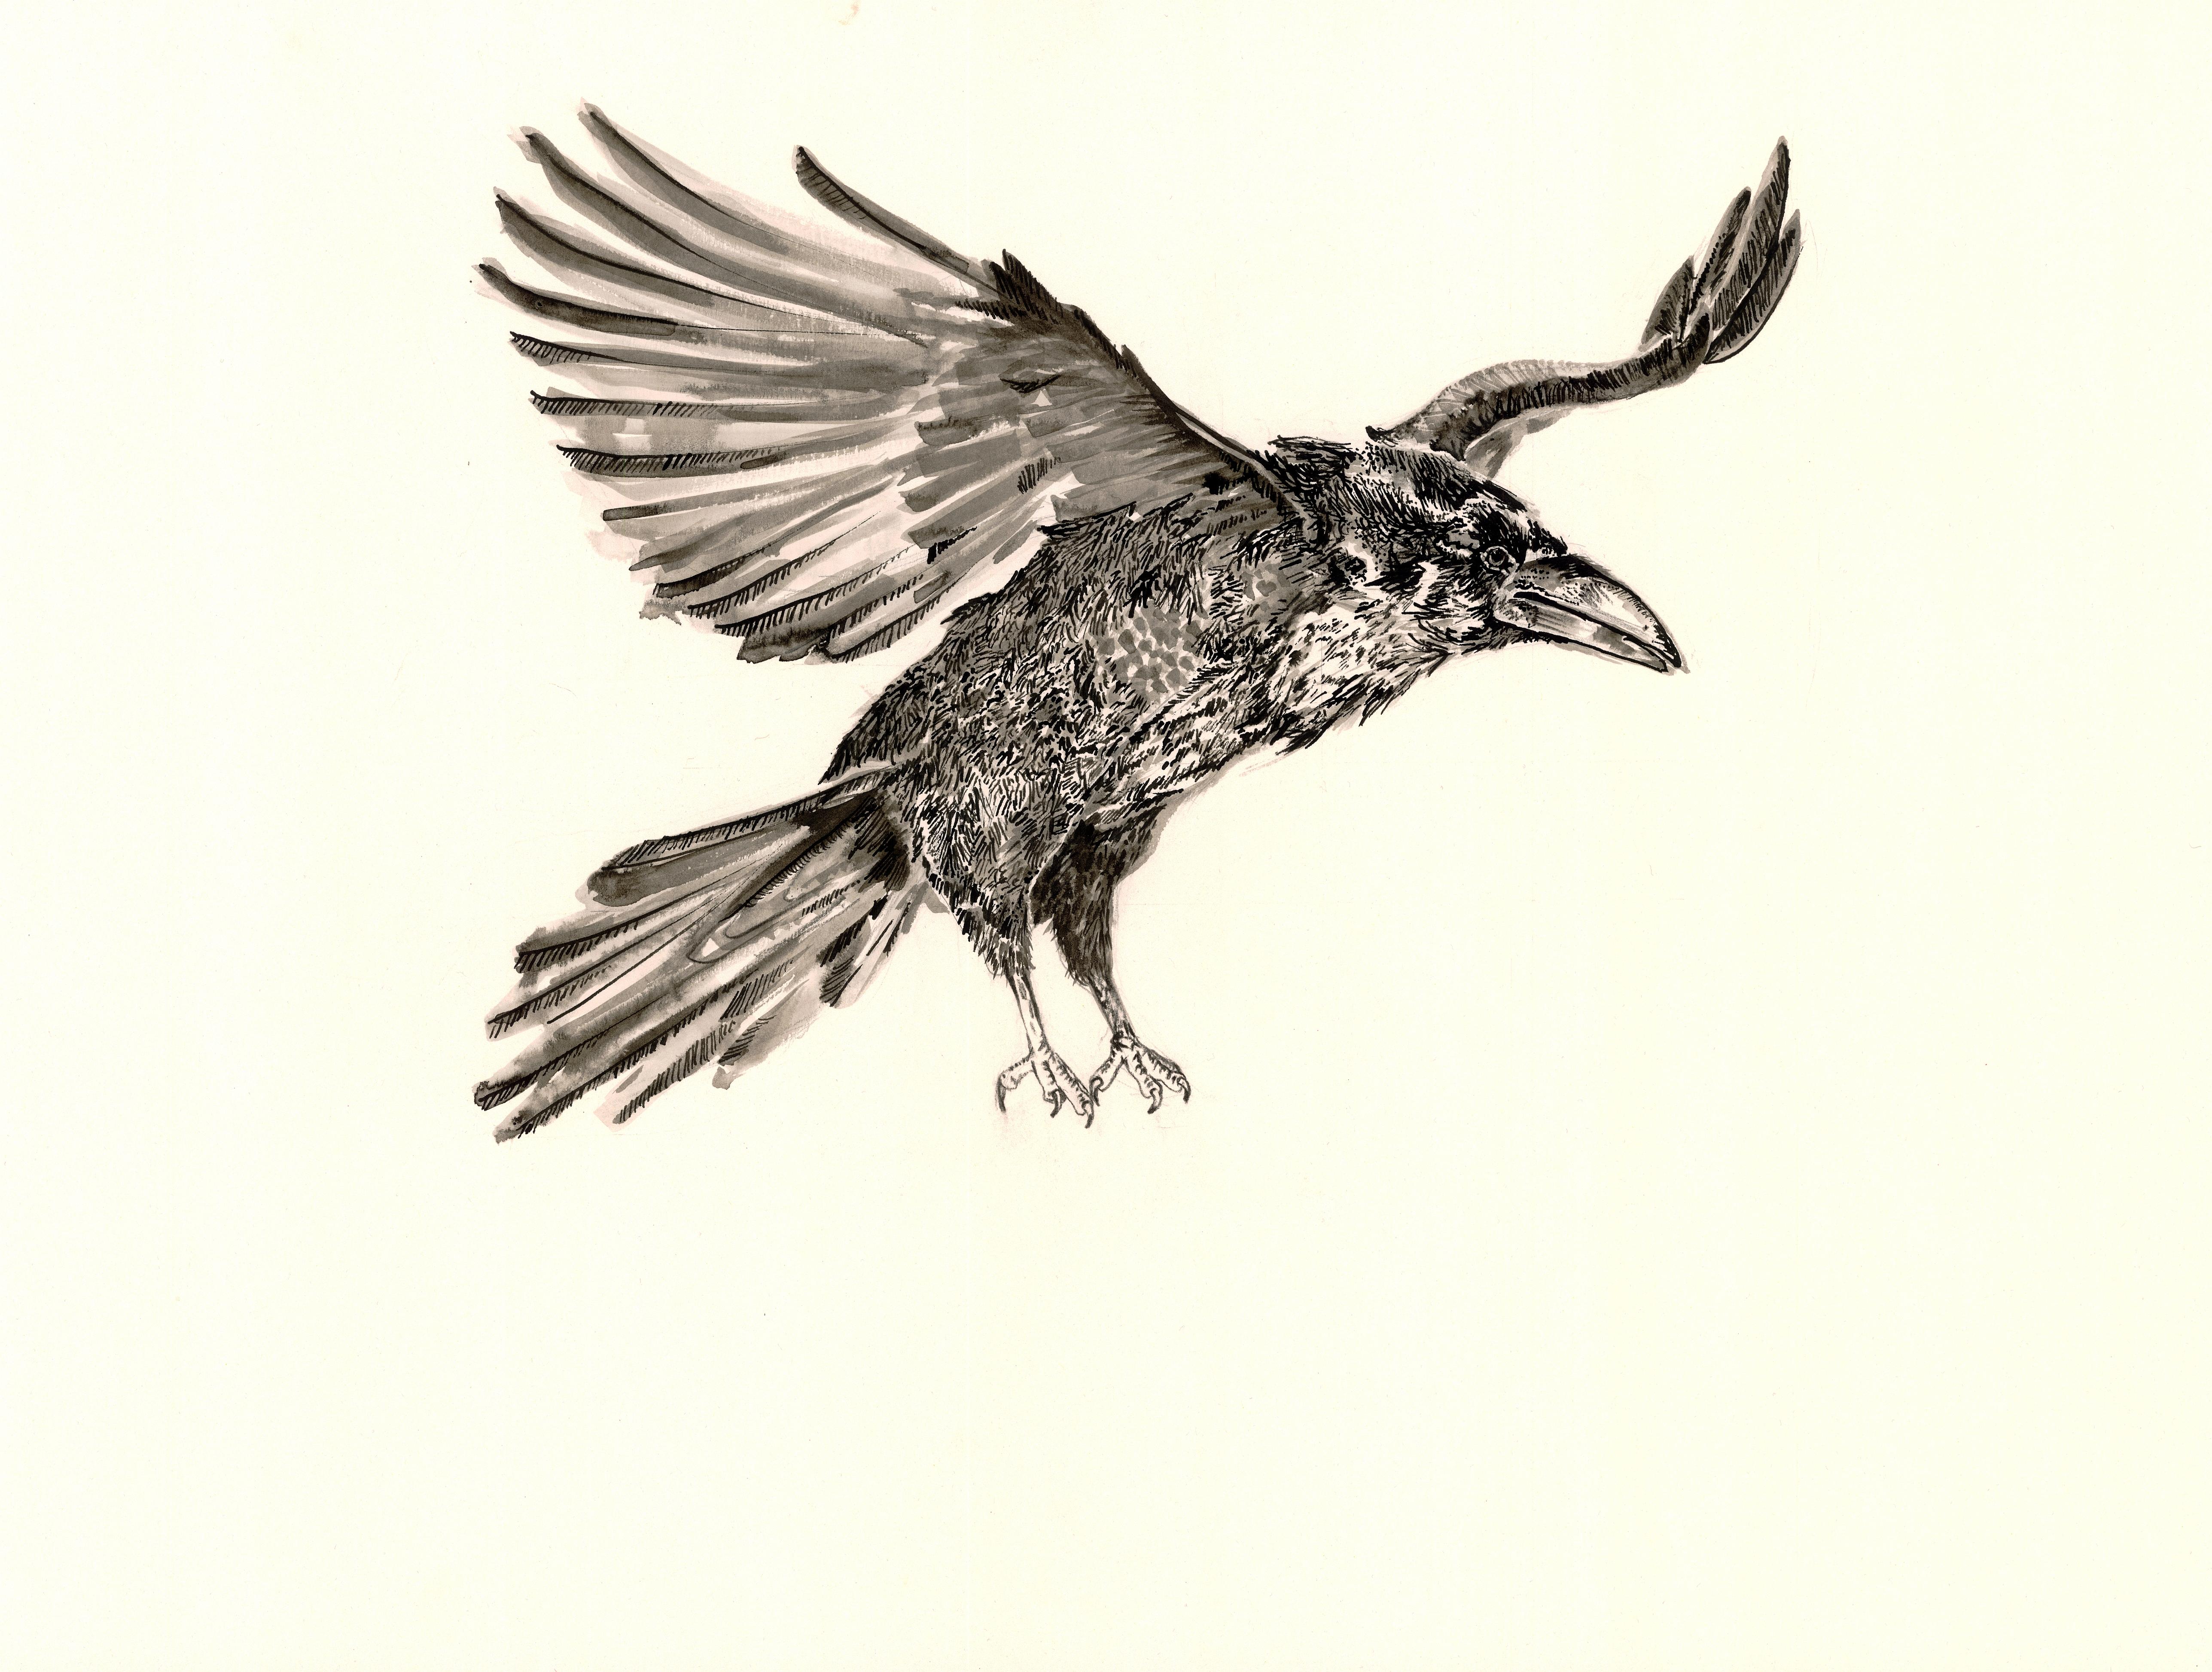 Animal Raven 5150x3892